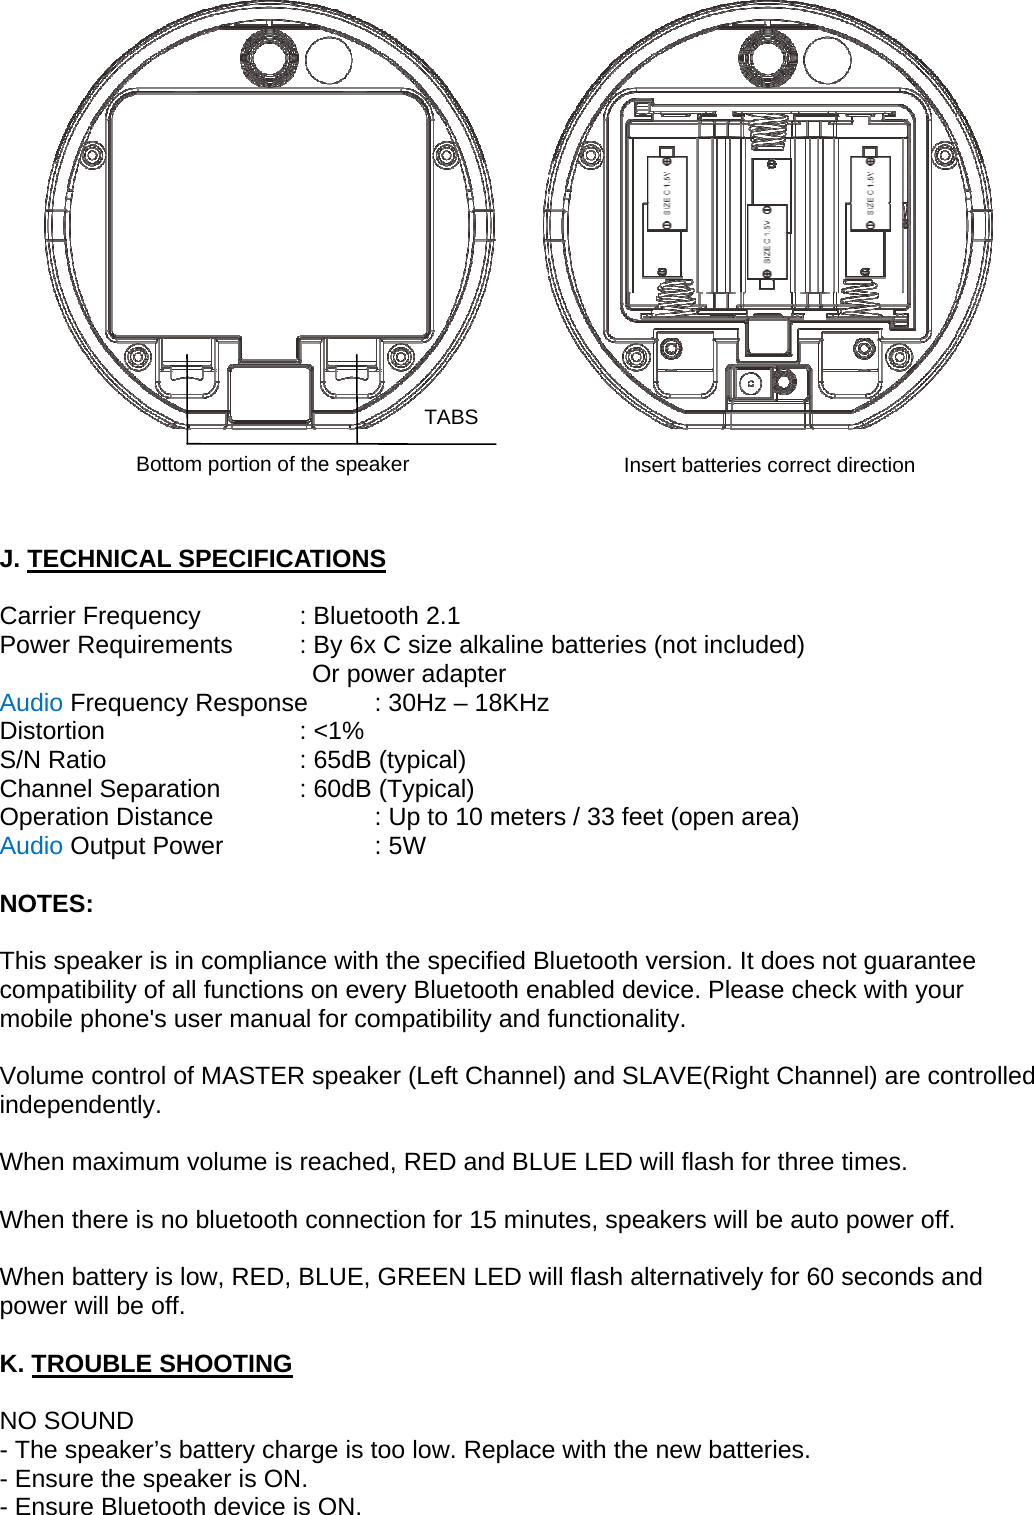 Bytech bluetooth speaker instructions